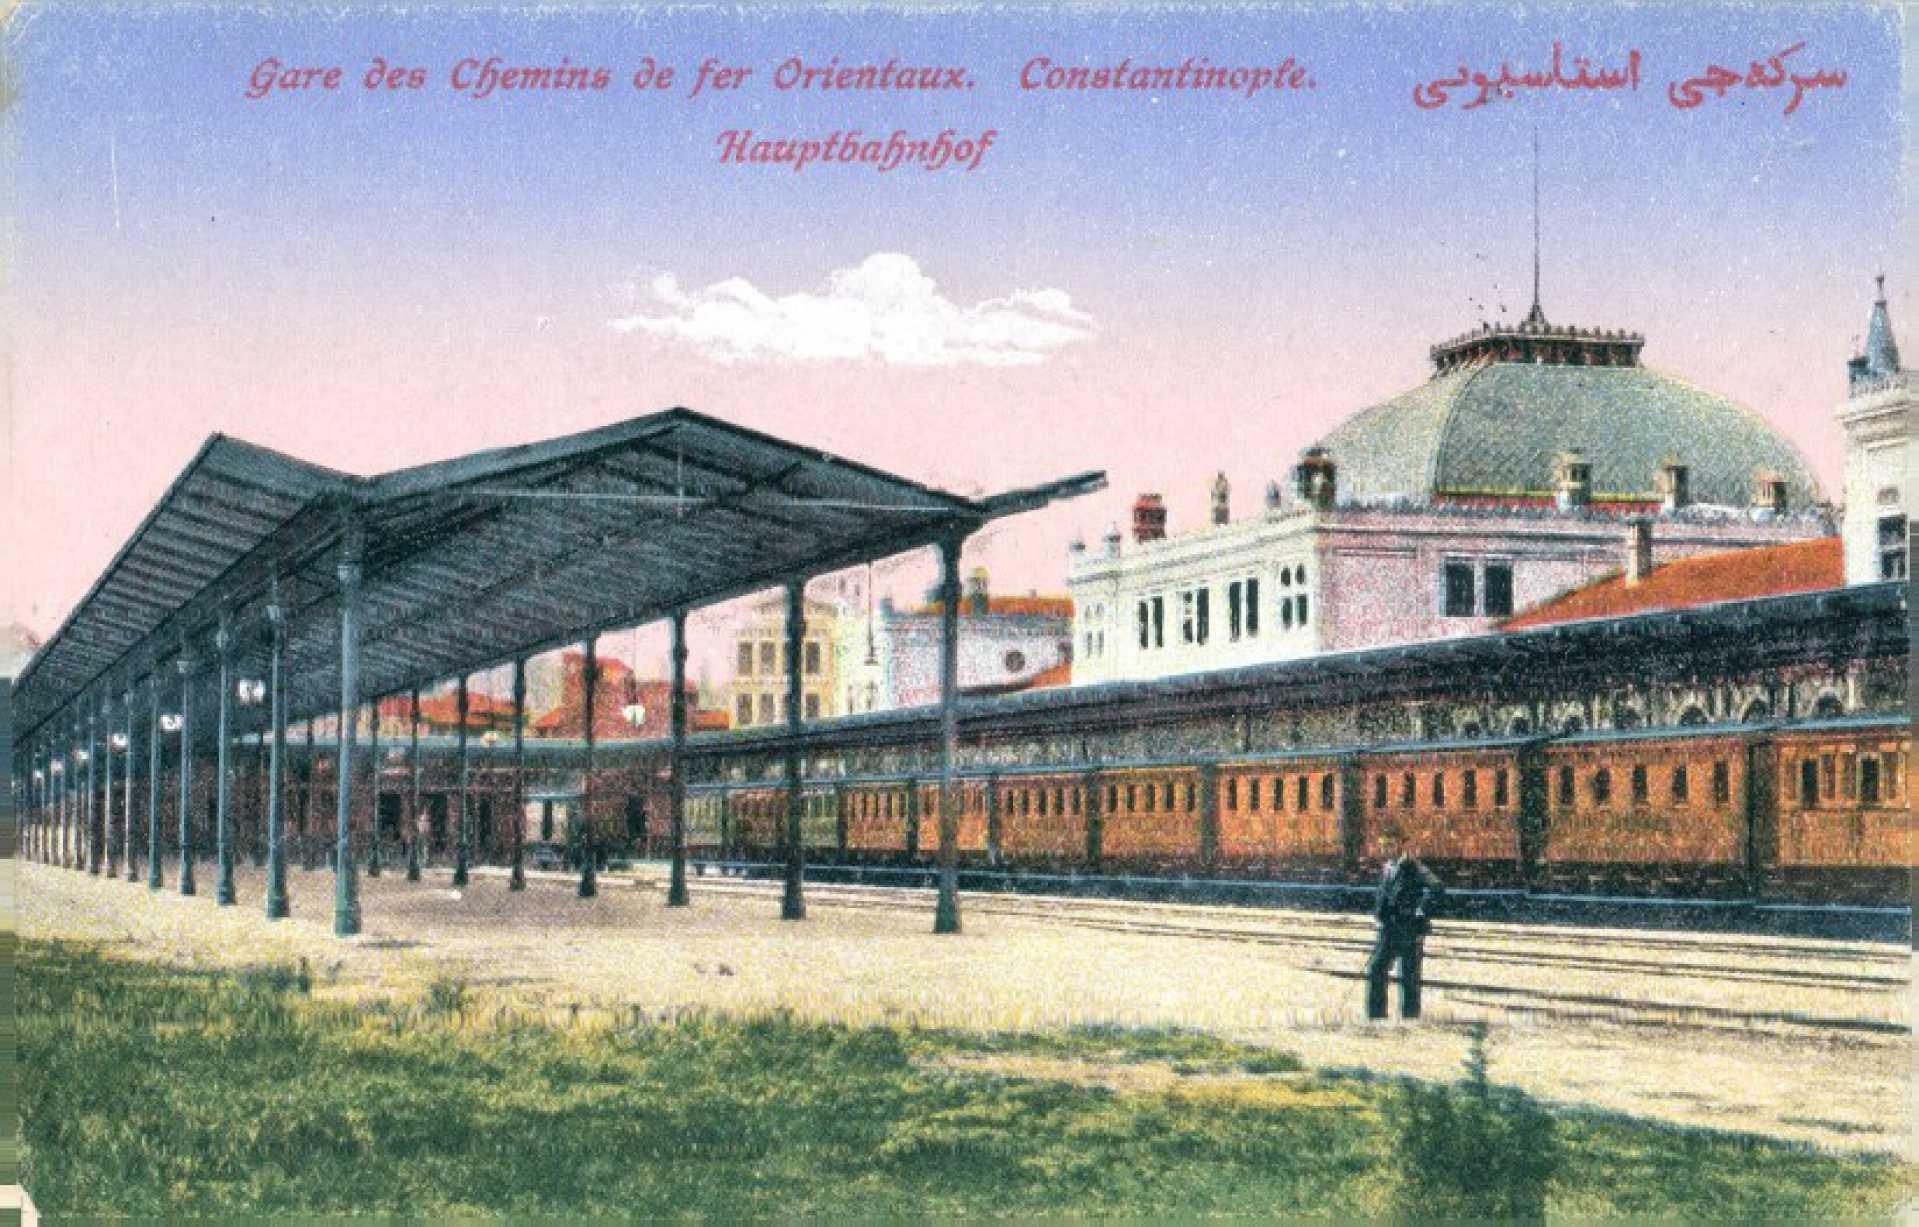 Gare des Chemina de fer Orientaux